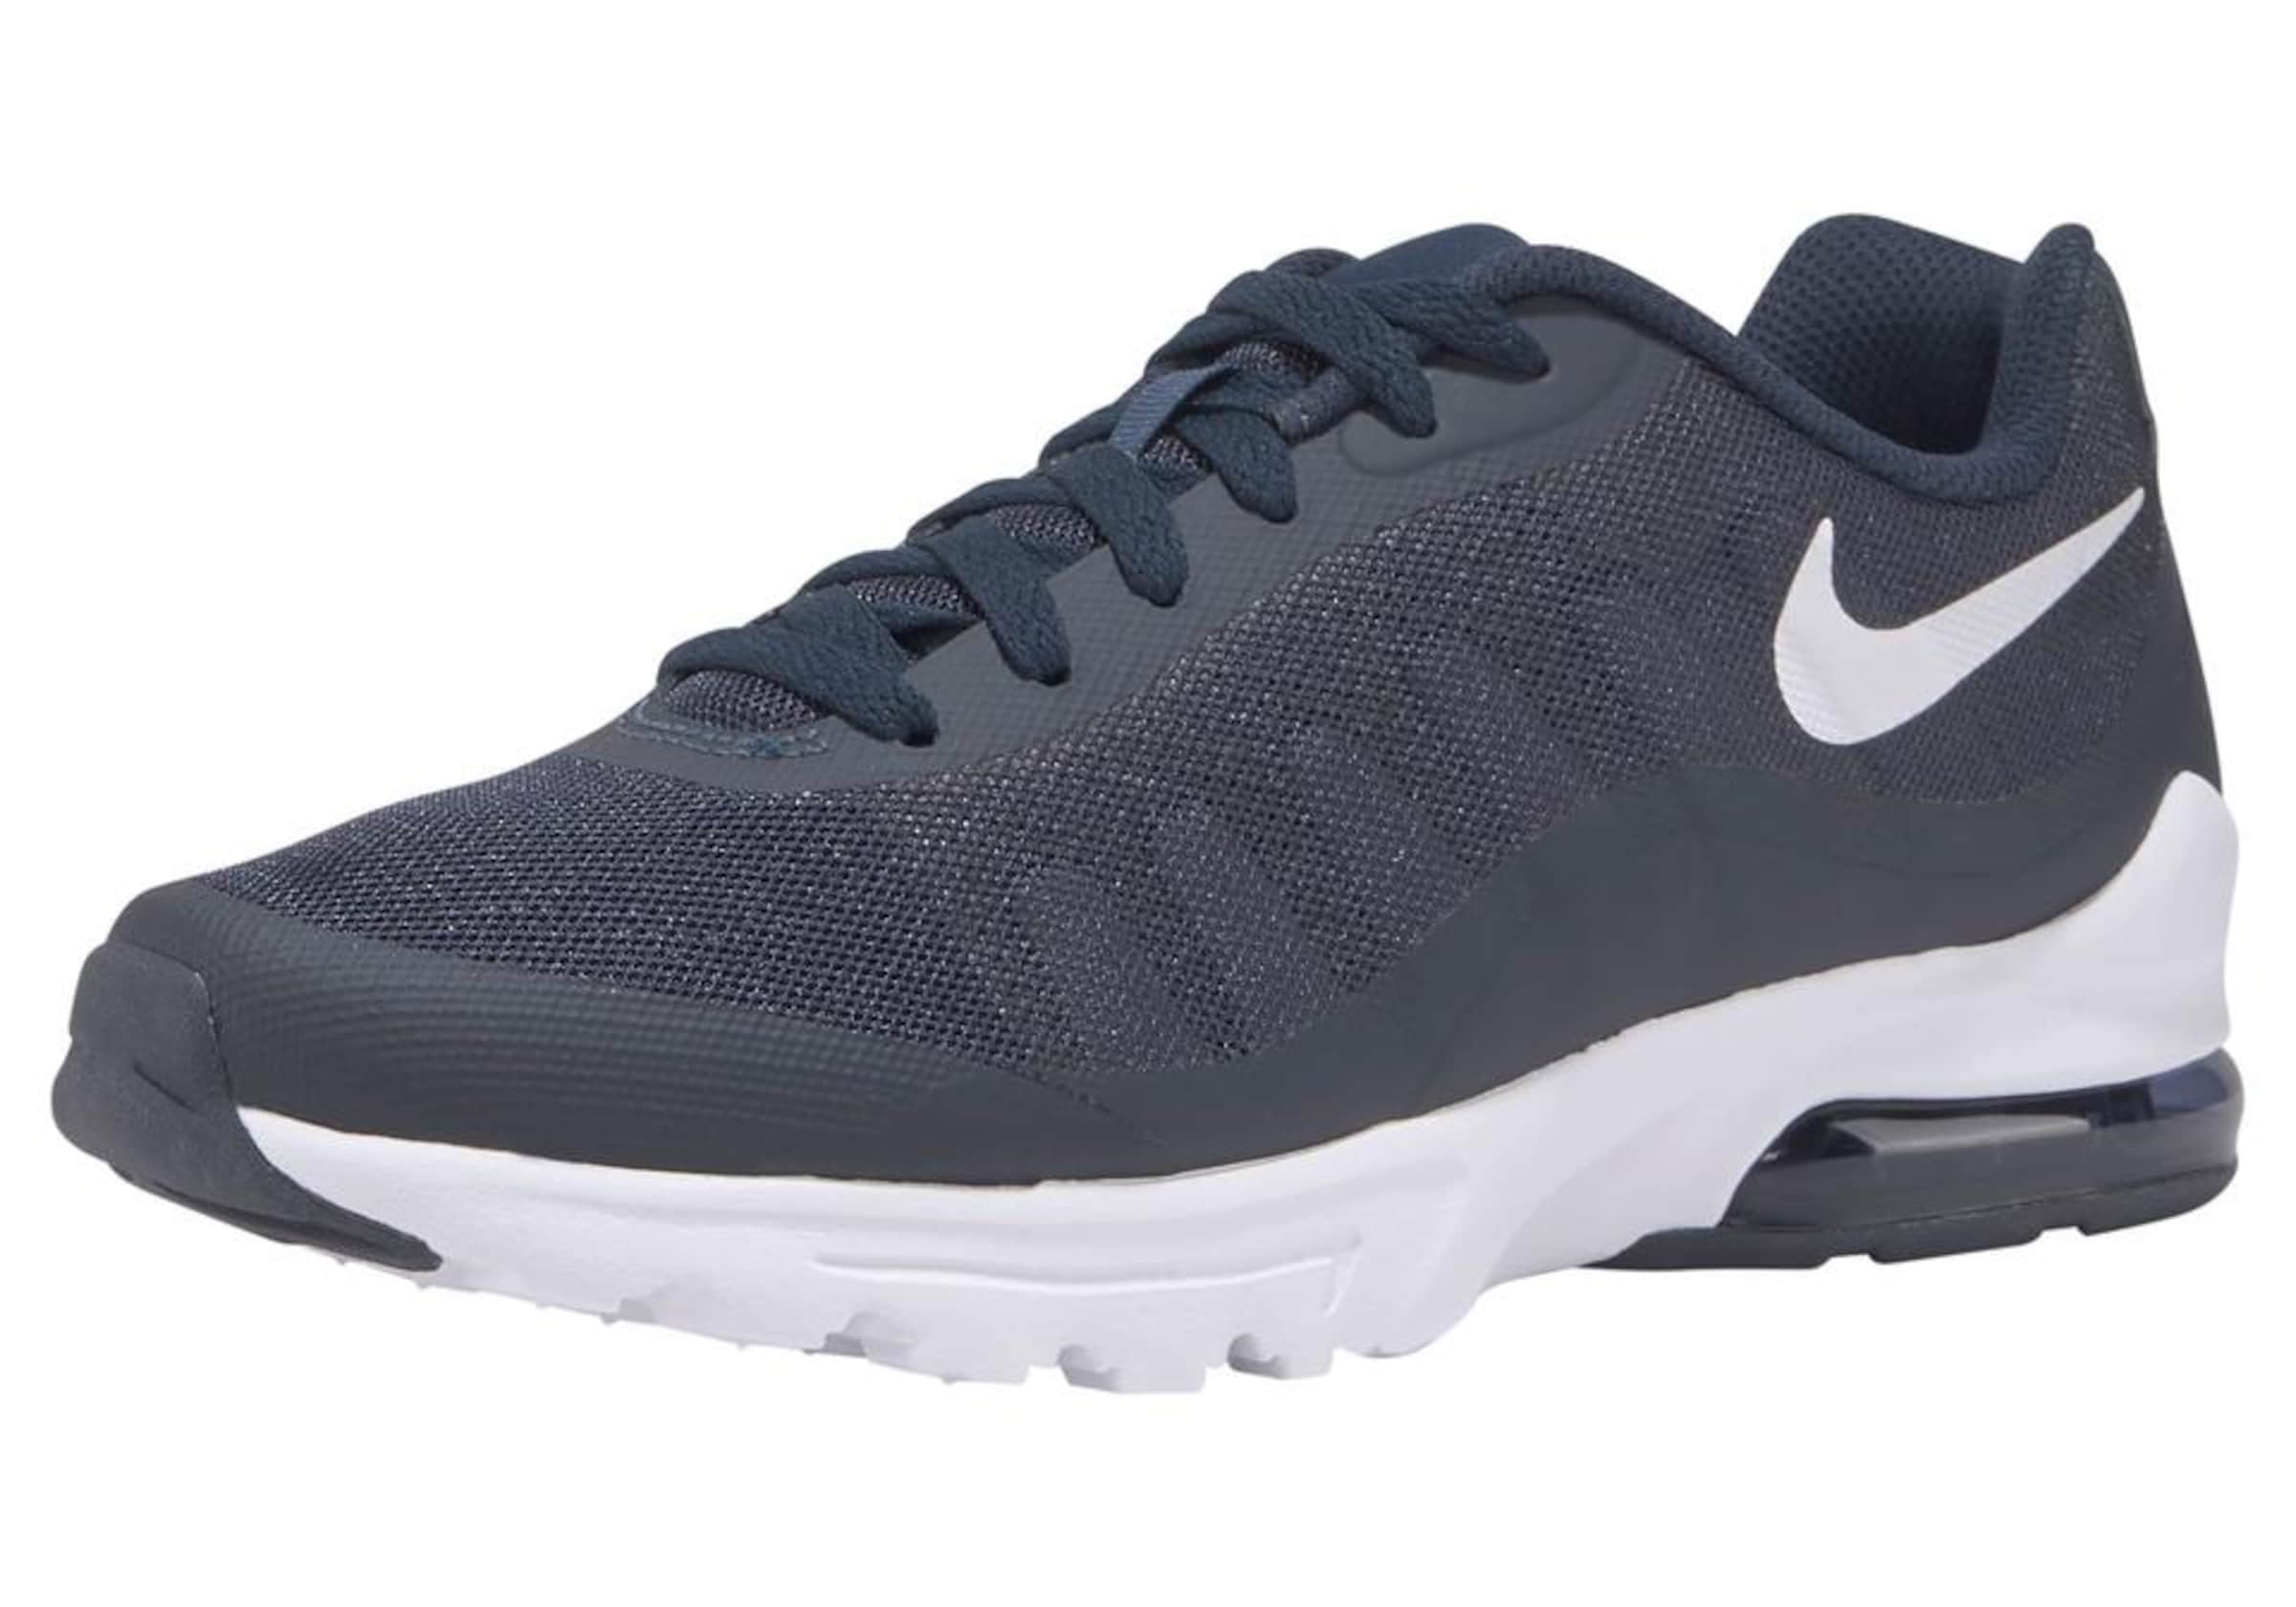 Max 'air Nike Sneaker Invigor' SchwarzWeiß Sportswear In IYWEDH9be2